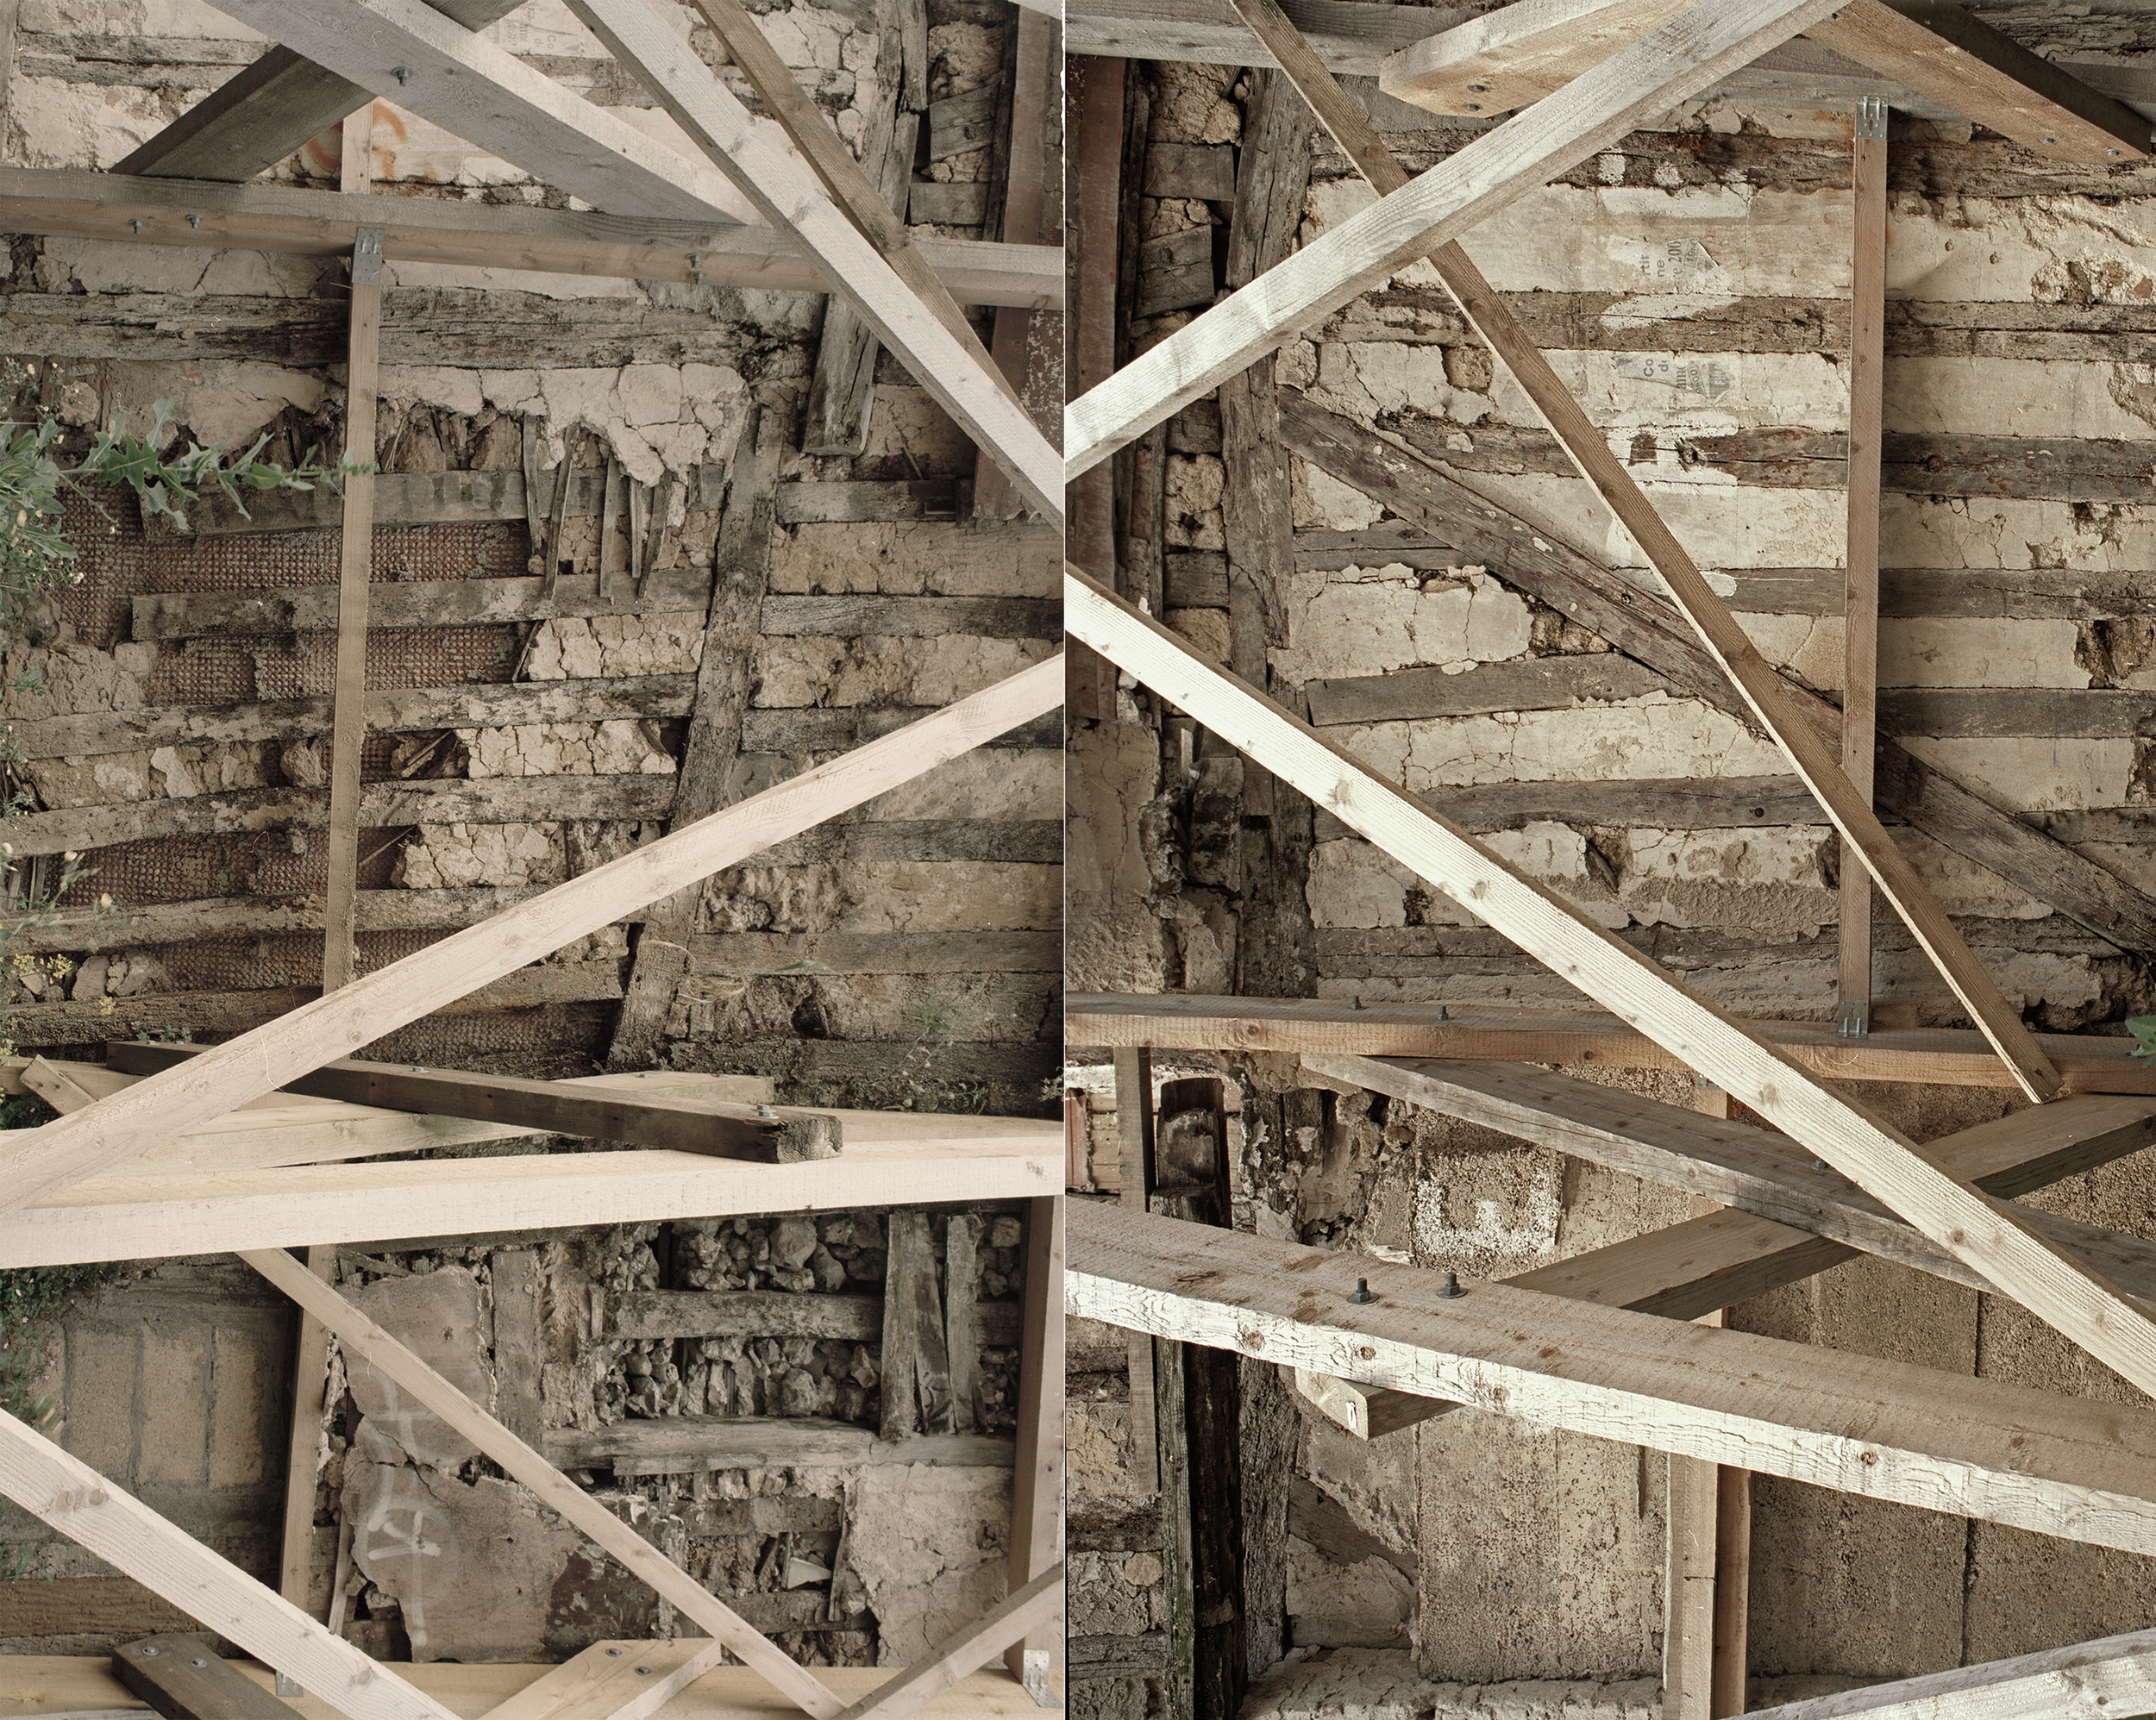 Collapse,  2015, pigment print on photo rag, 160 x 200cm